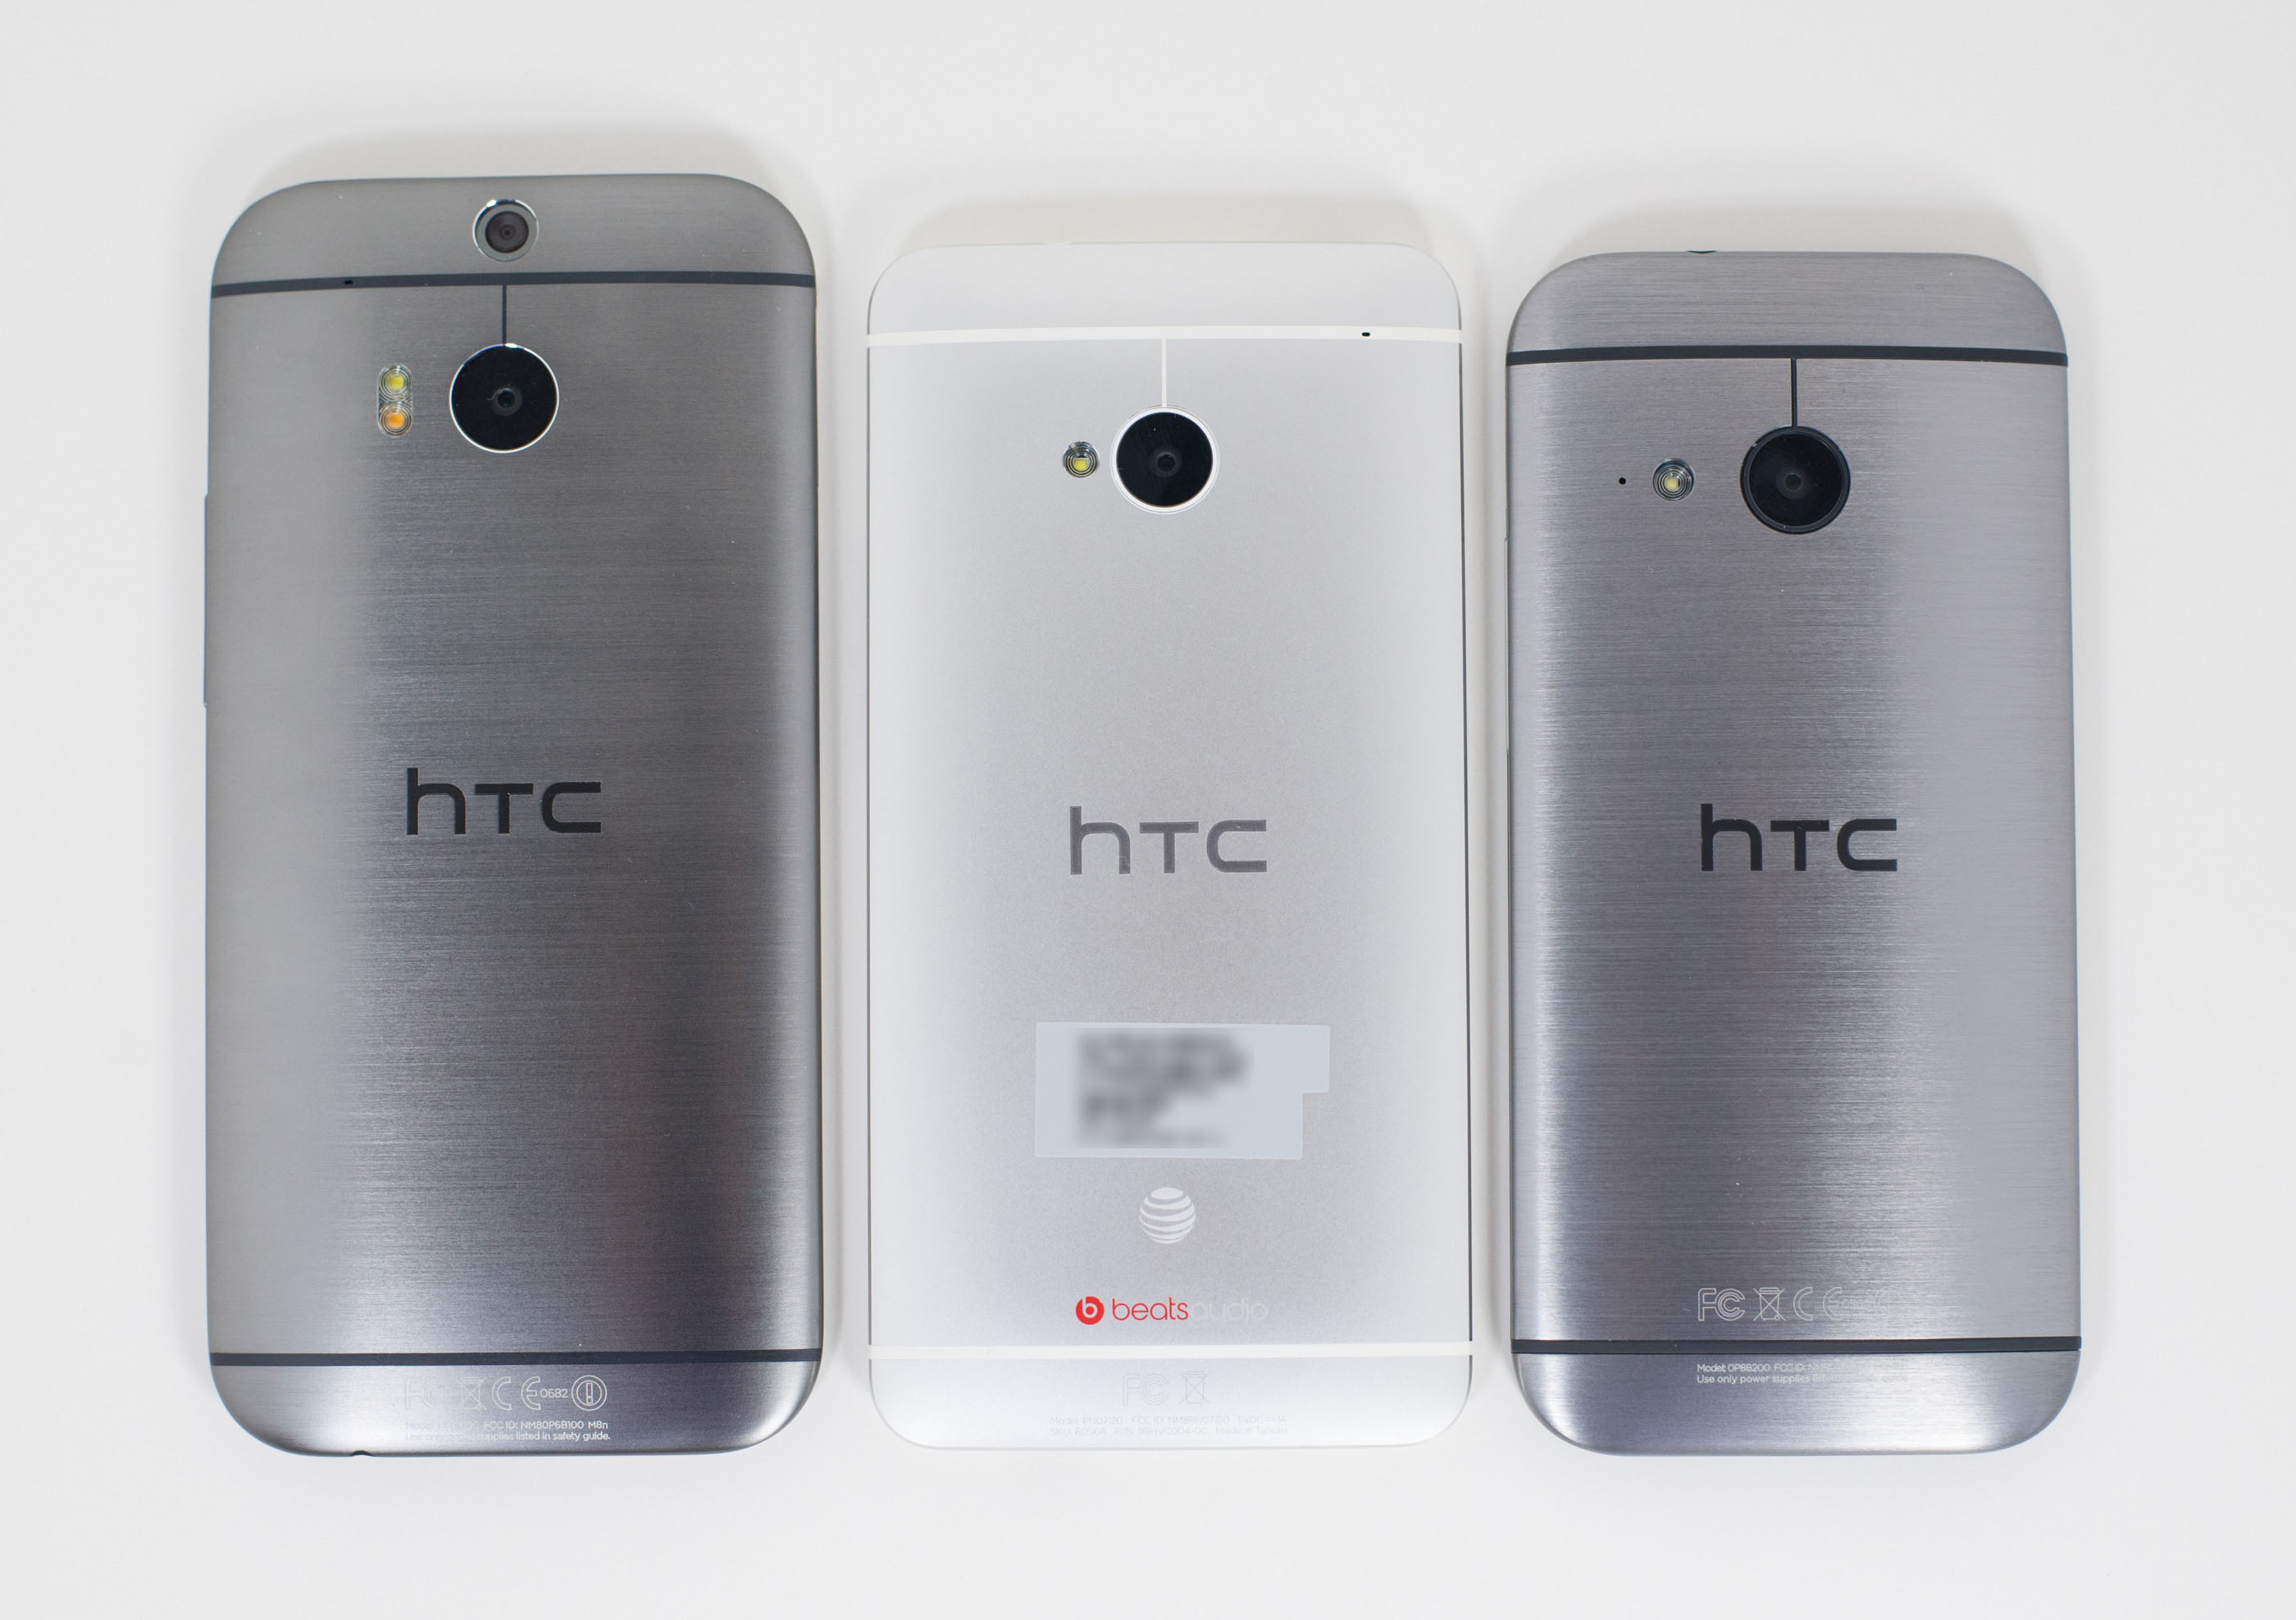 Glacial Silver HTC One Mini 2 Cheapest Contract Prices ... |Htc One Mini 2 Silver